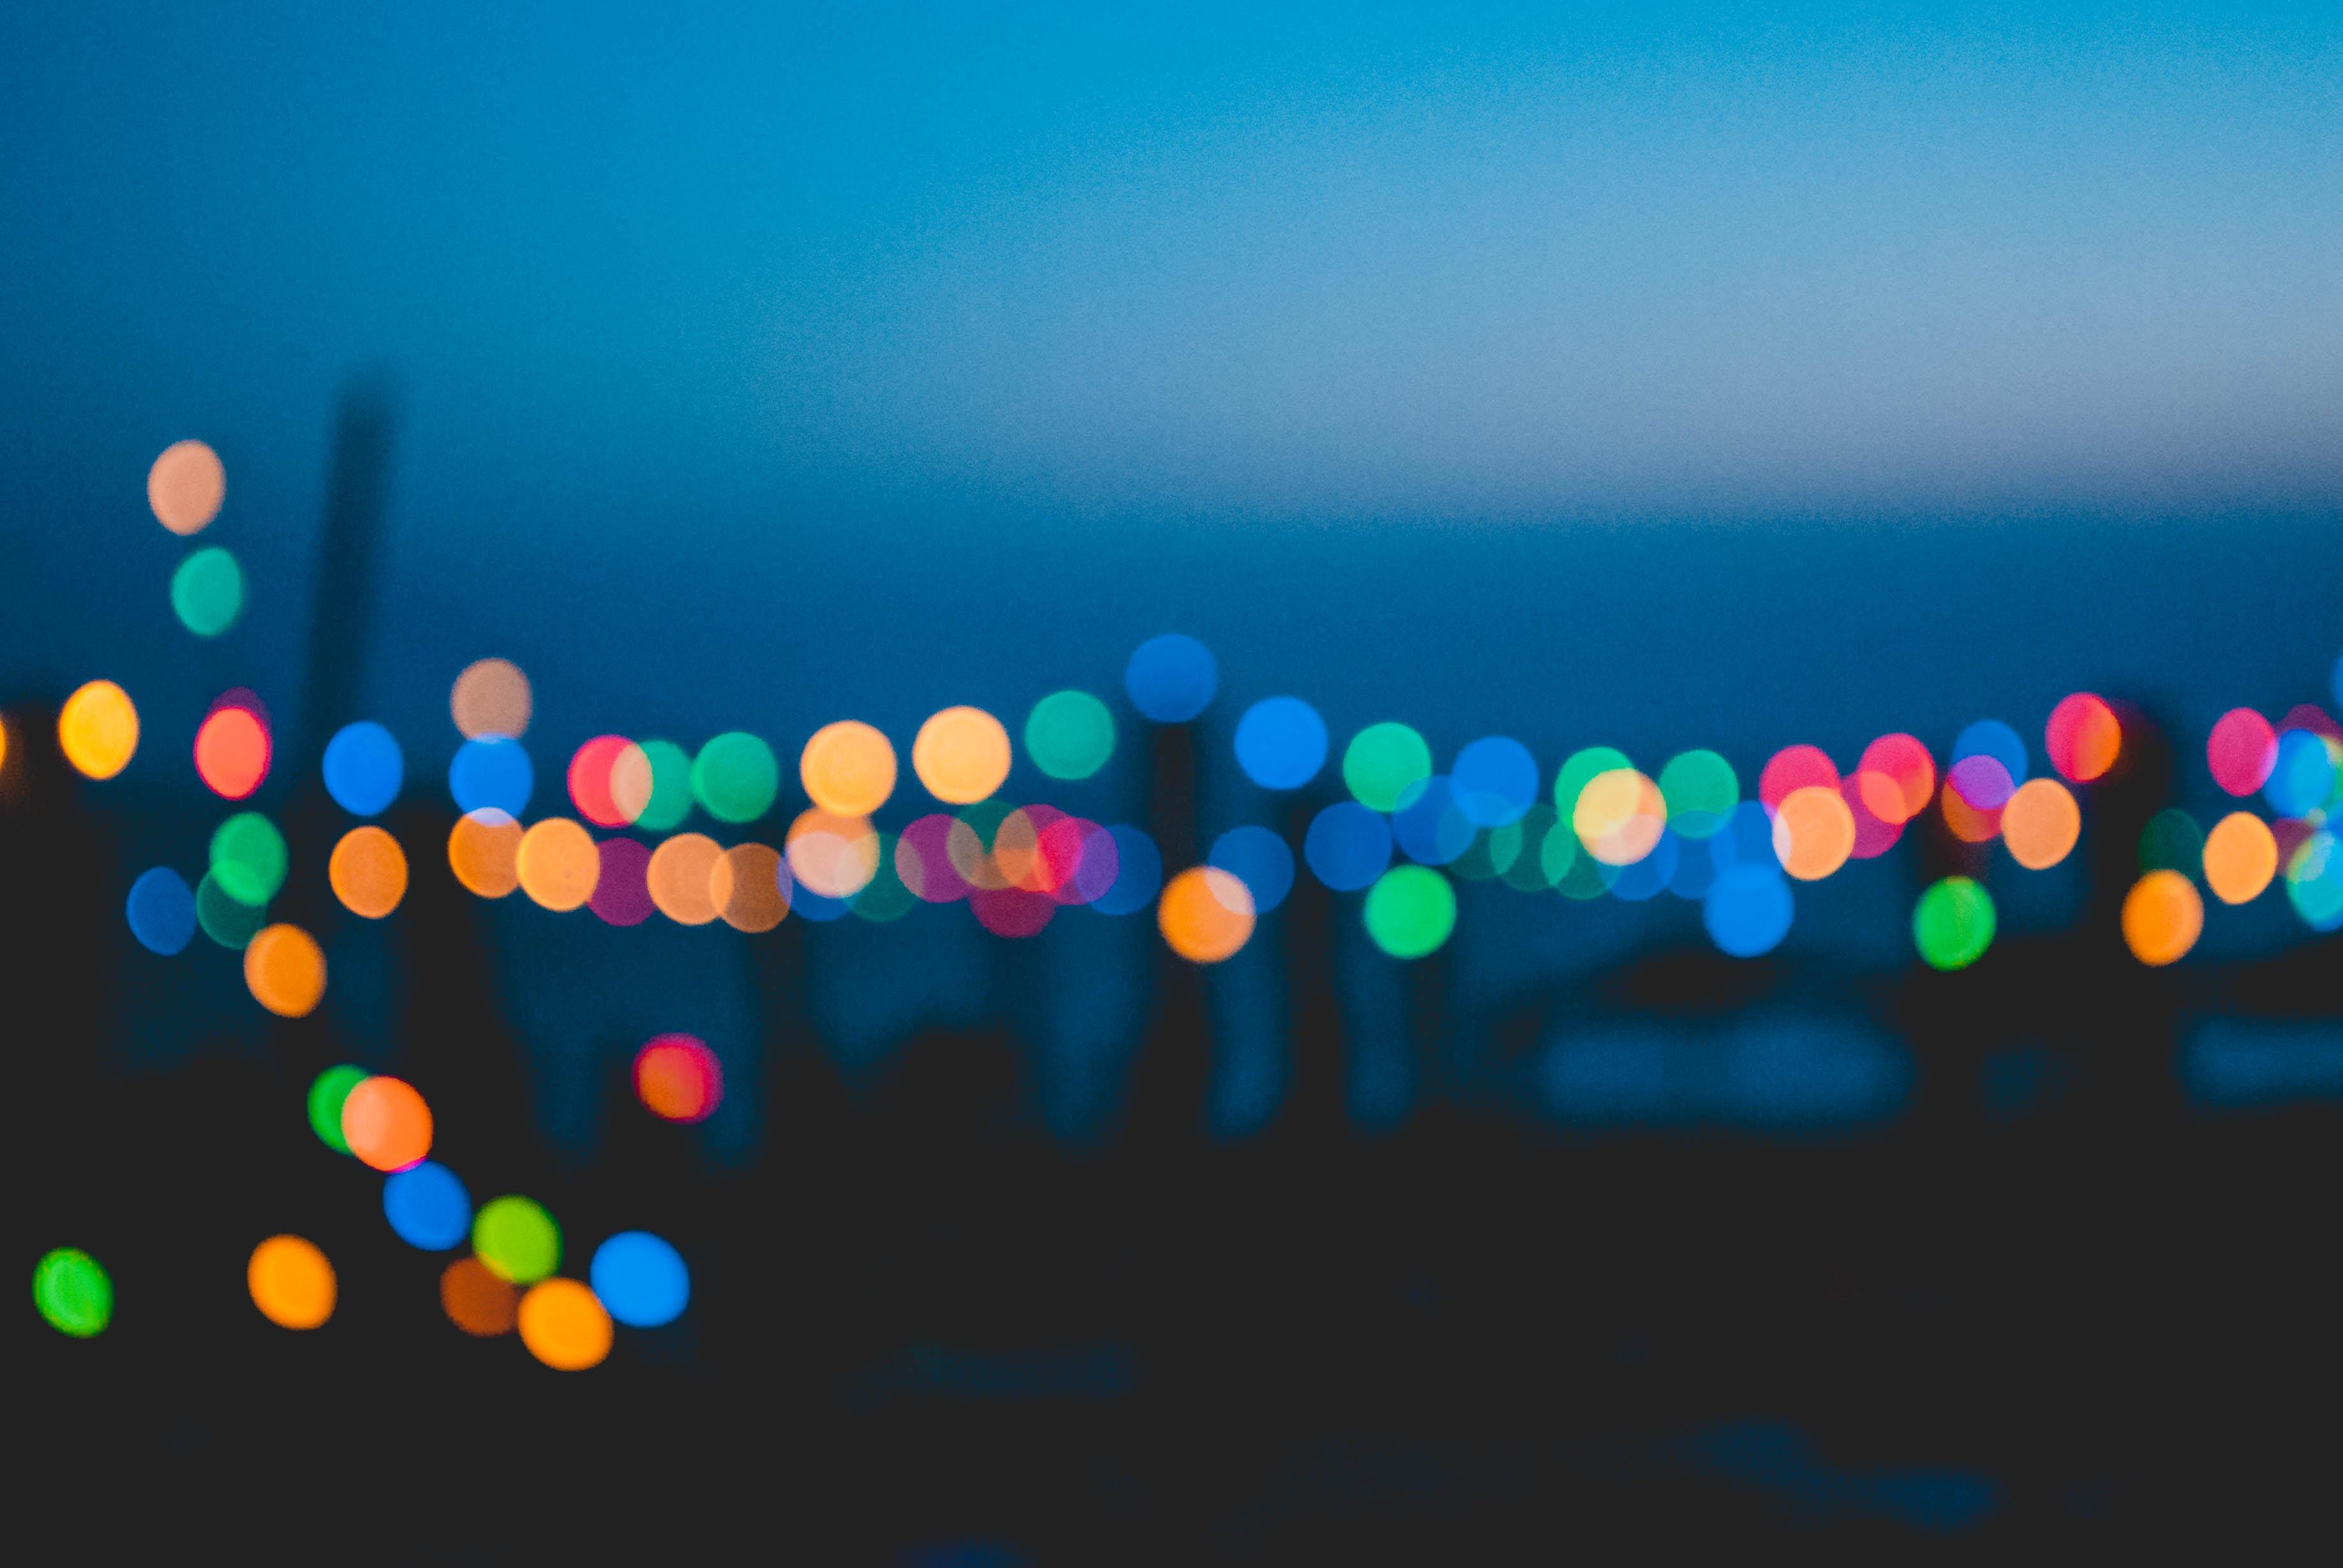 photography of bokeh lights